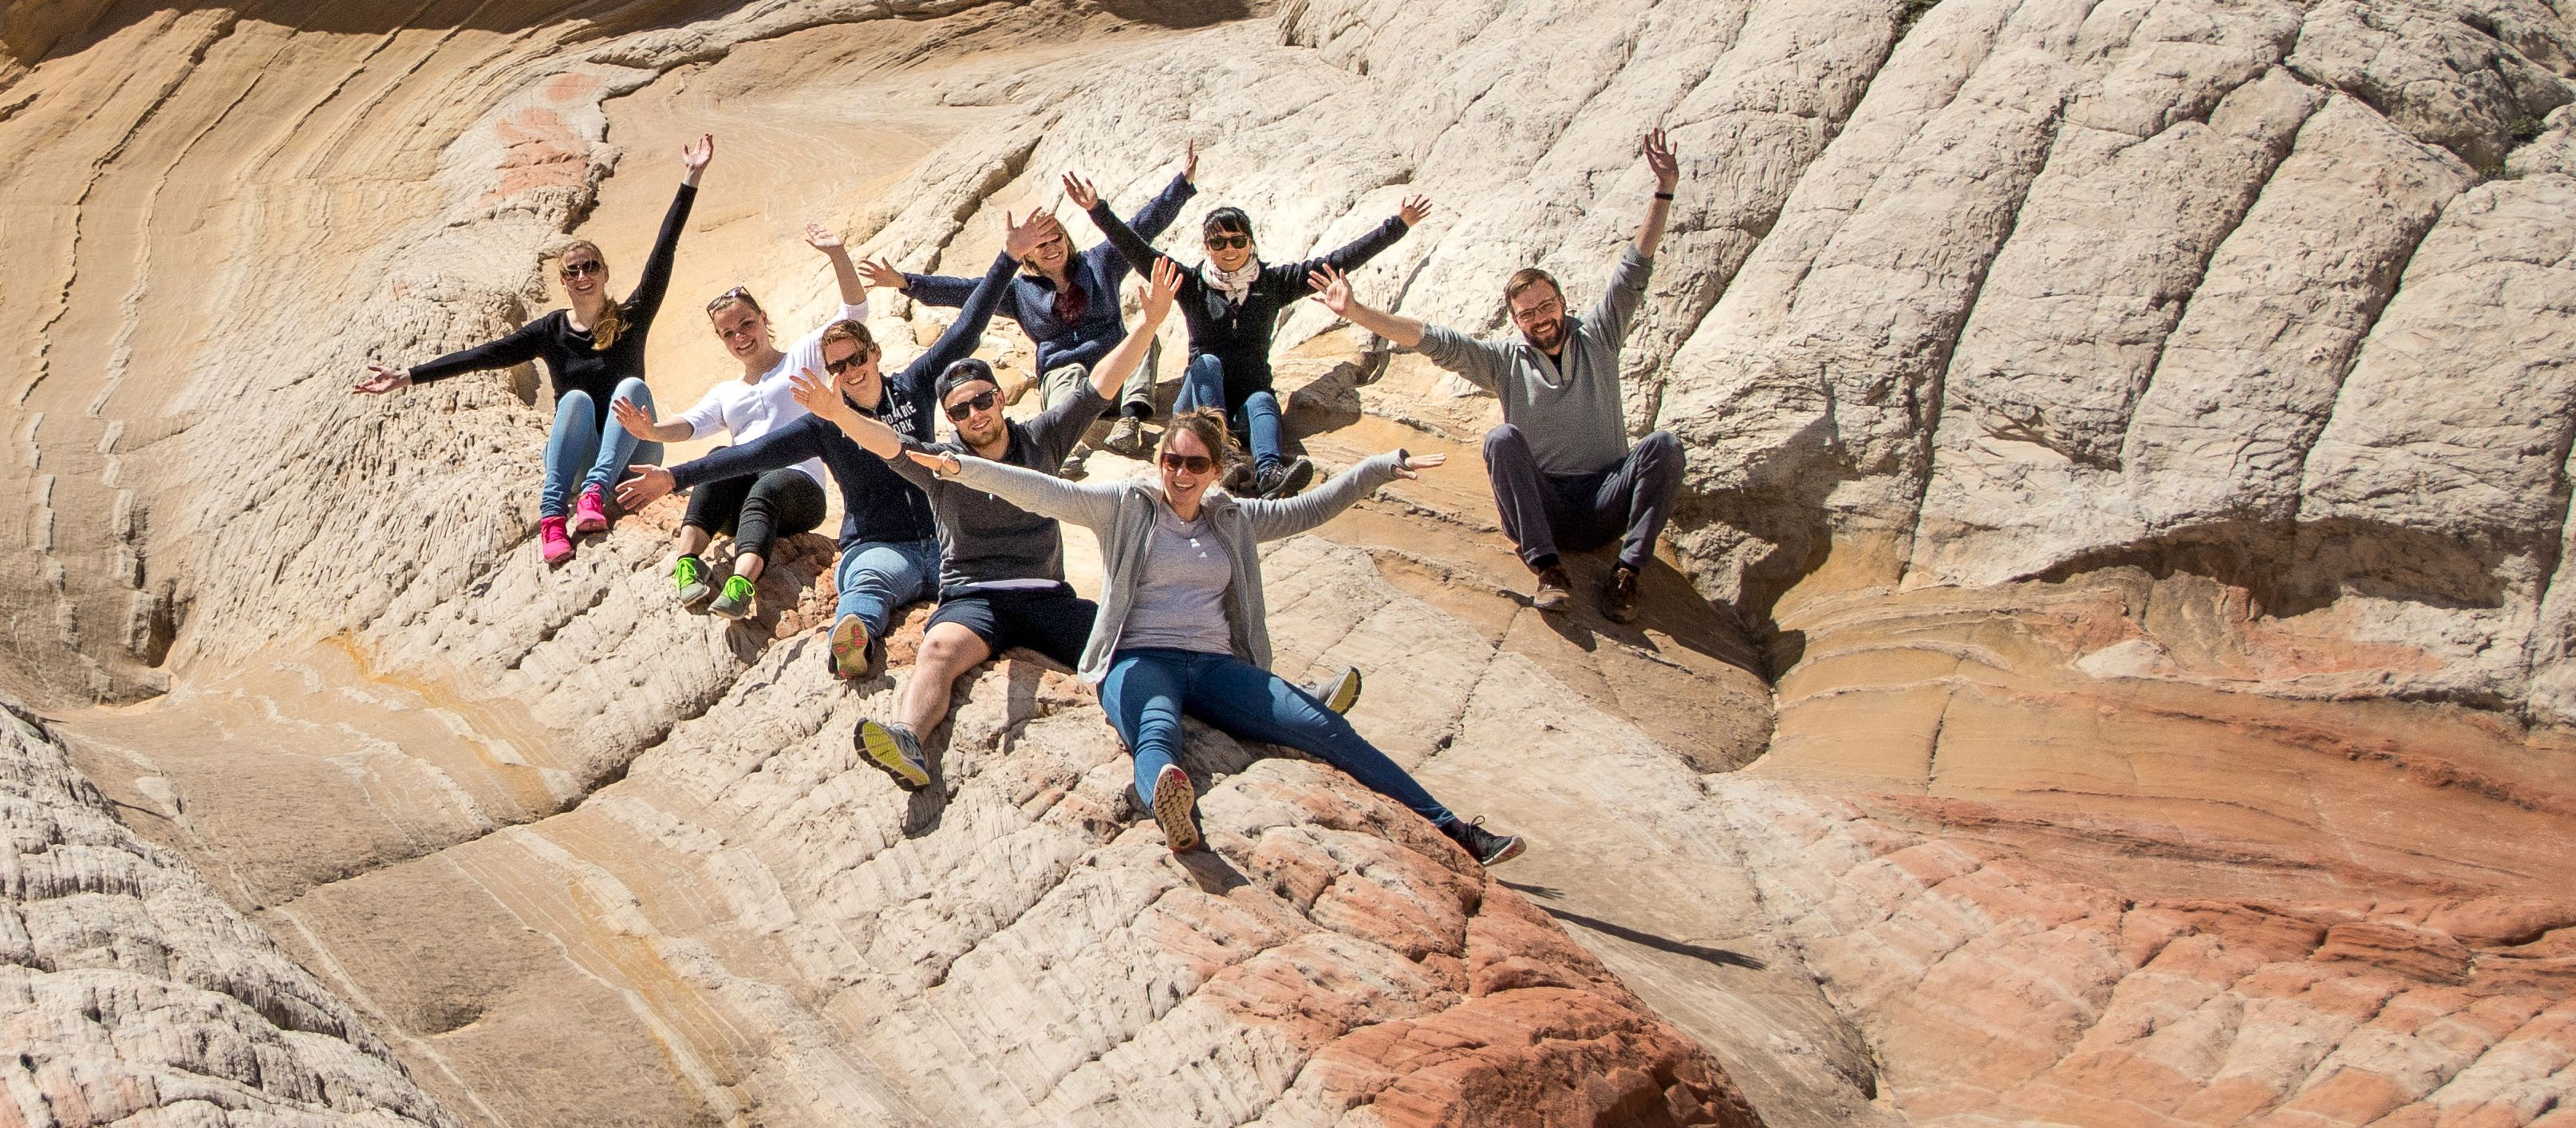 Utah Fam 2017 Gruppenfoto im White Pocket, Arizona